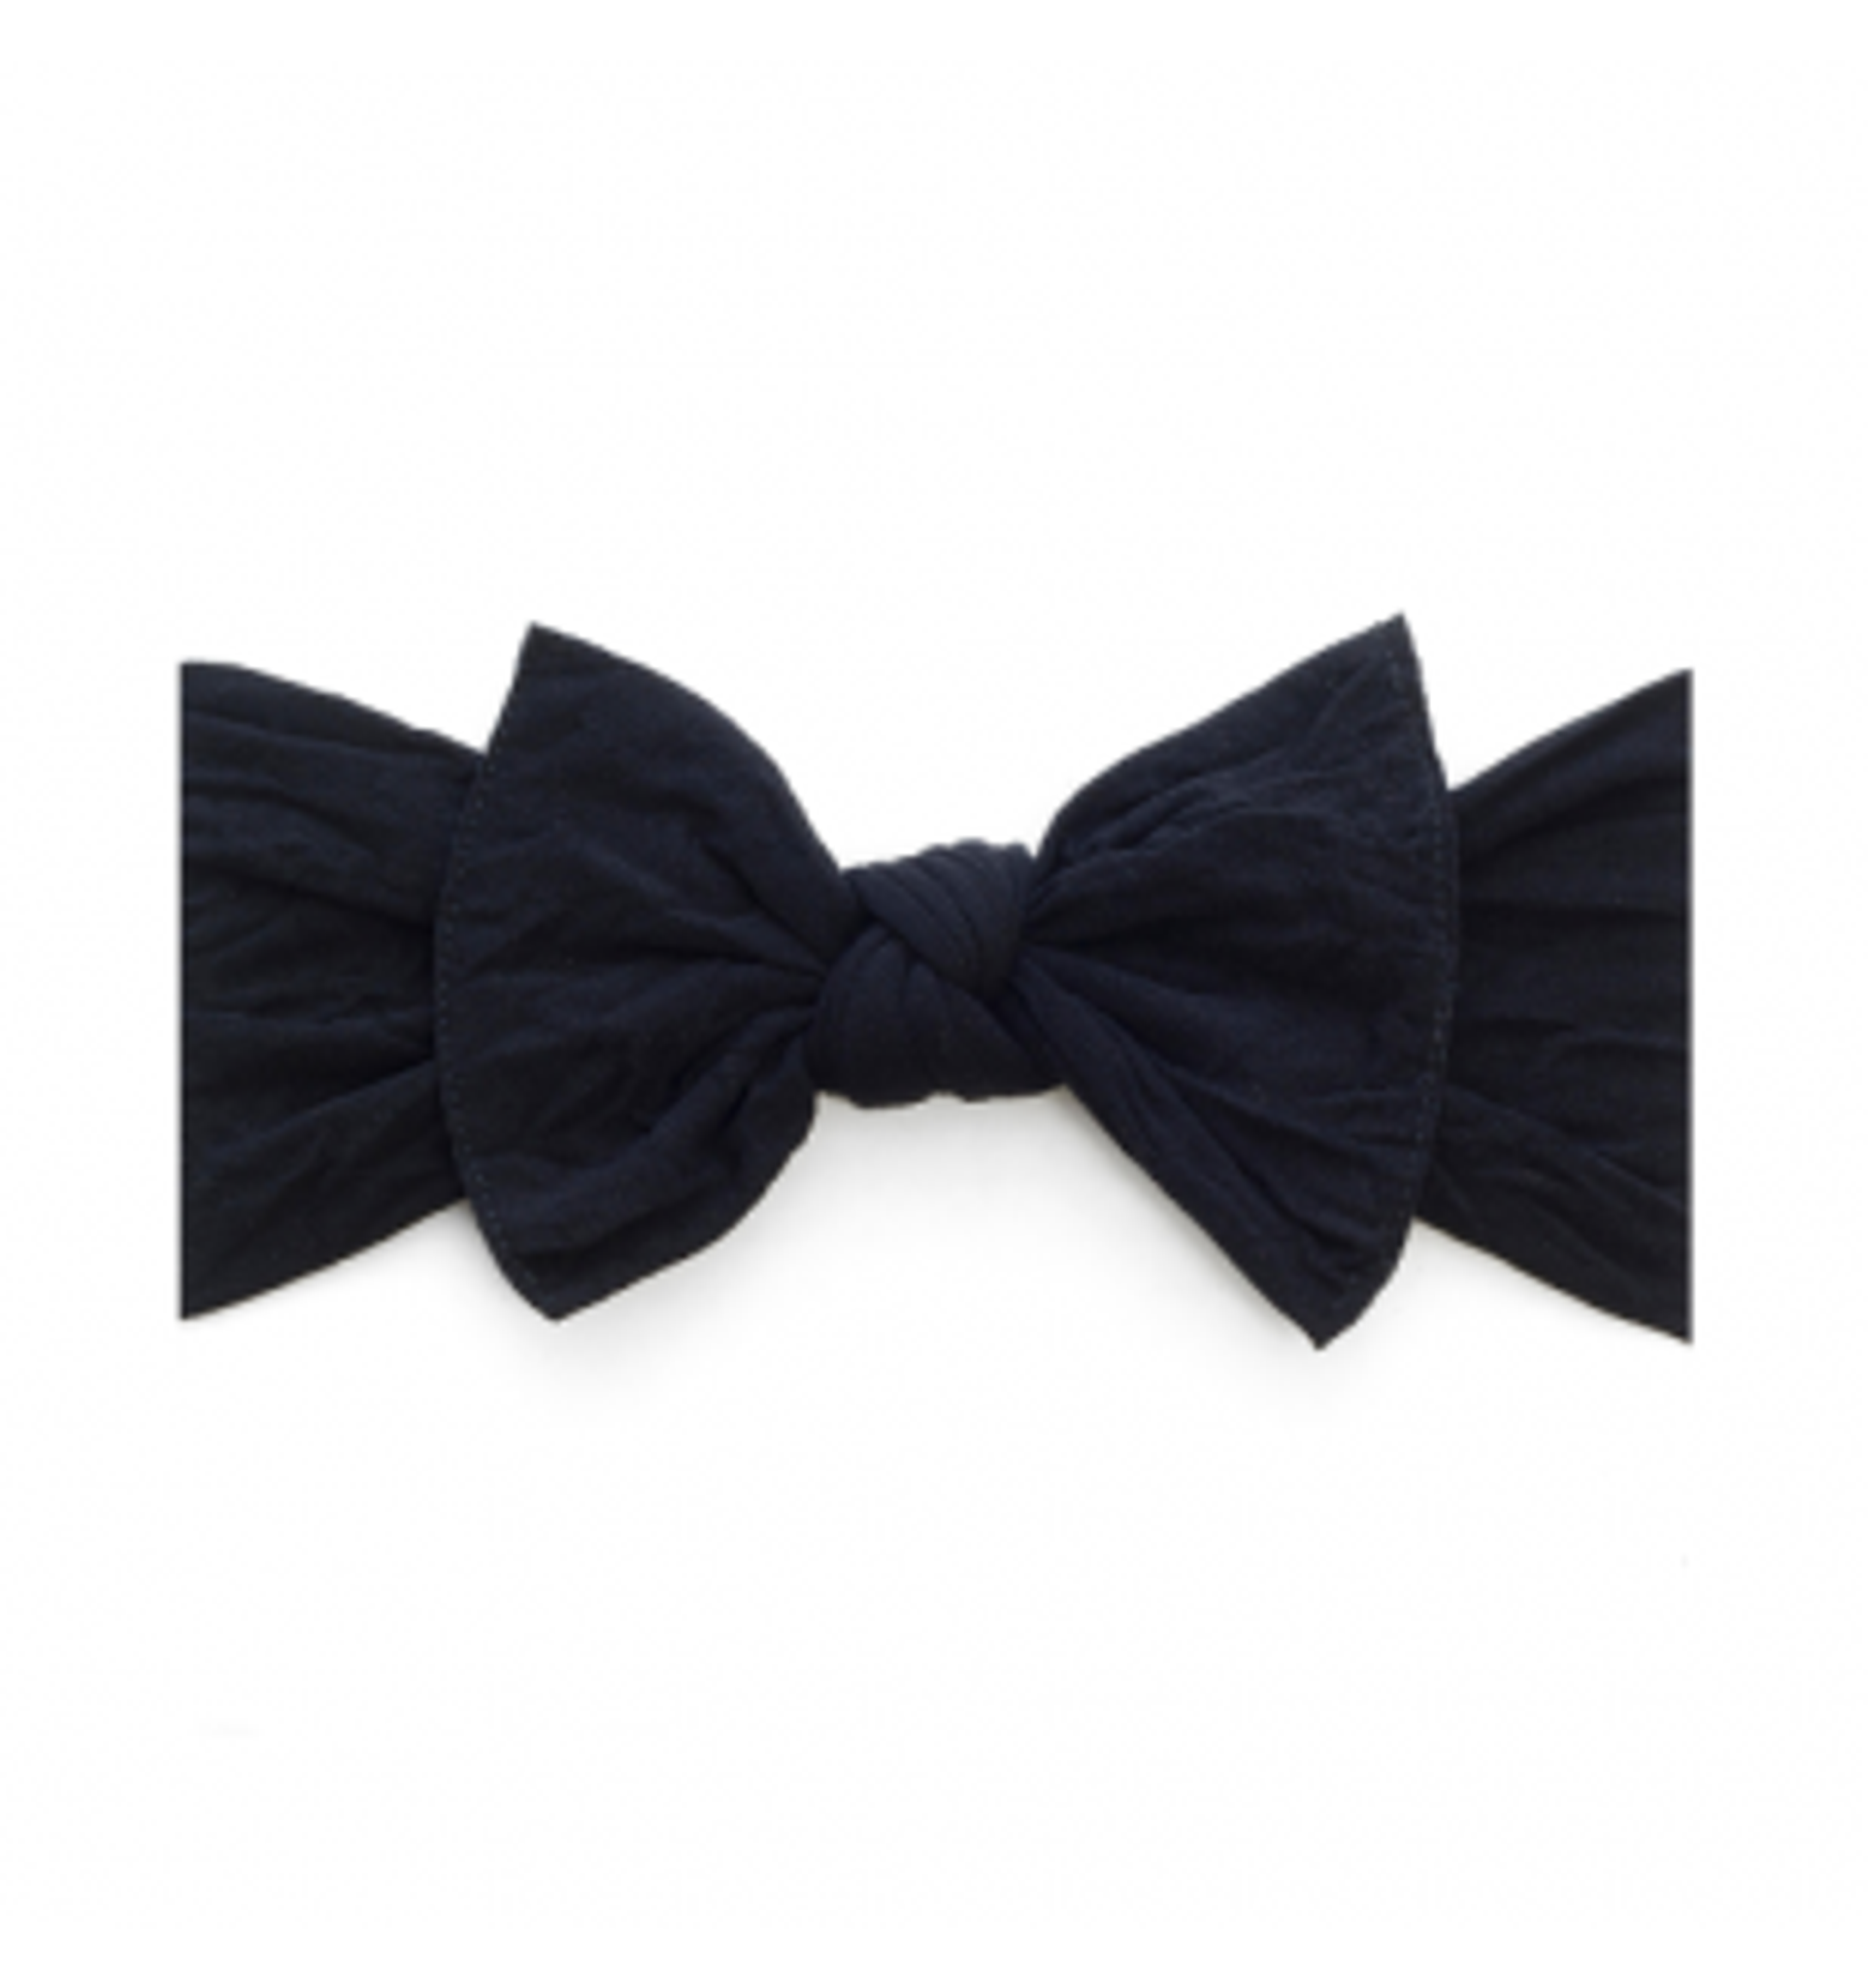 Baby Bling Solid Bow Headband - Black